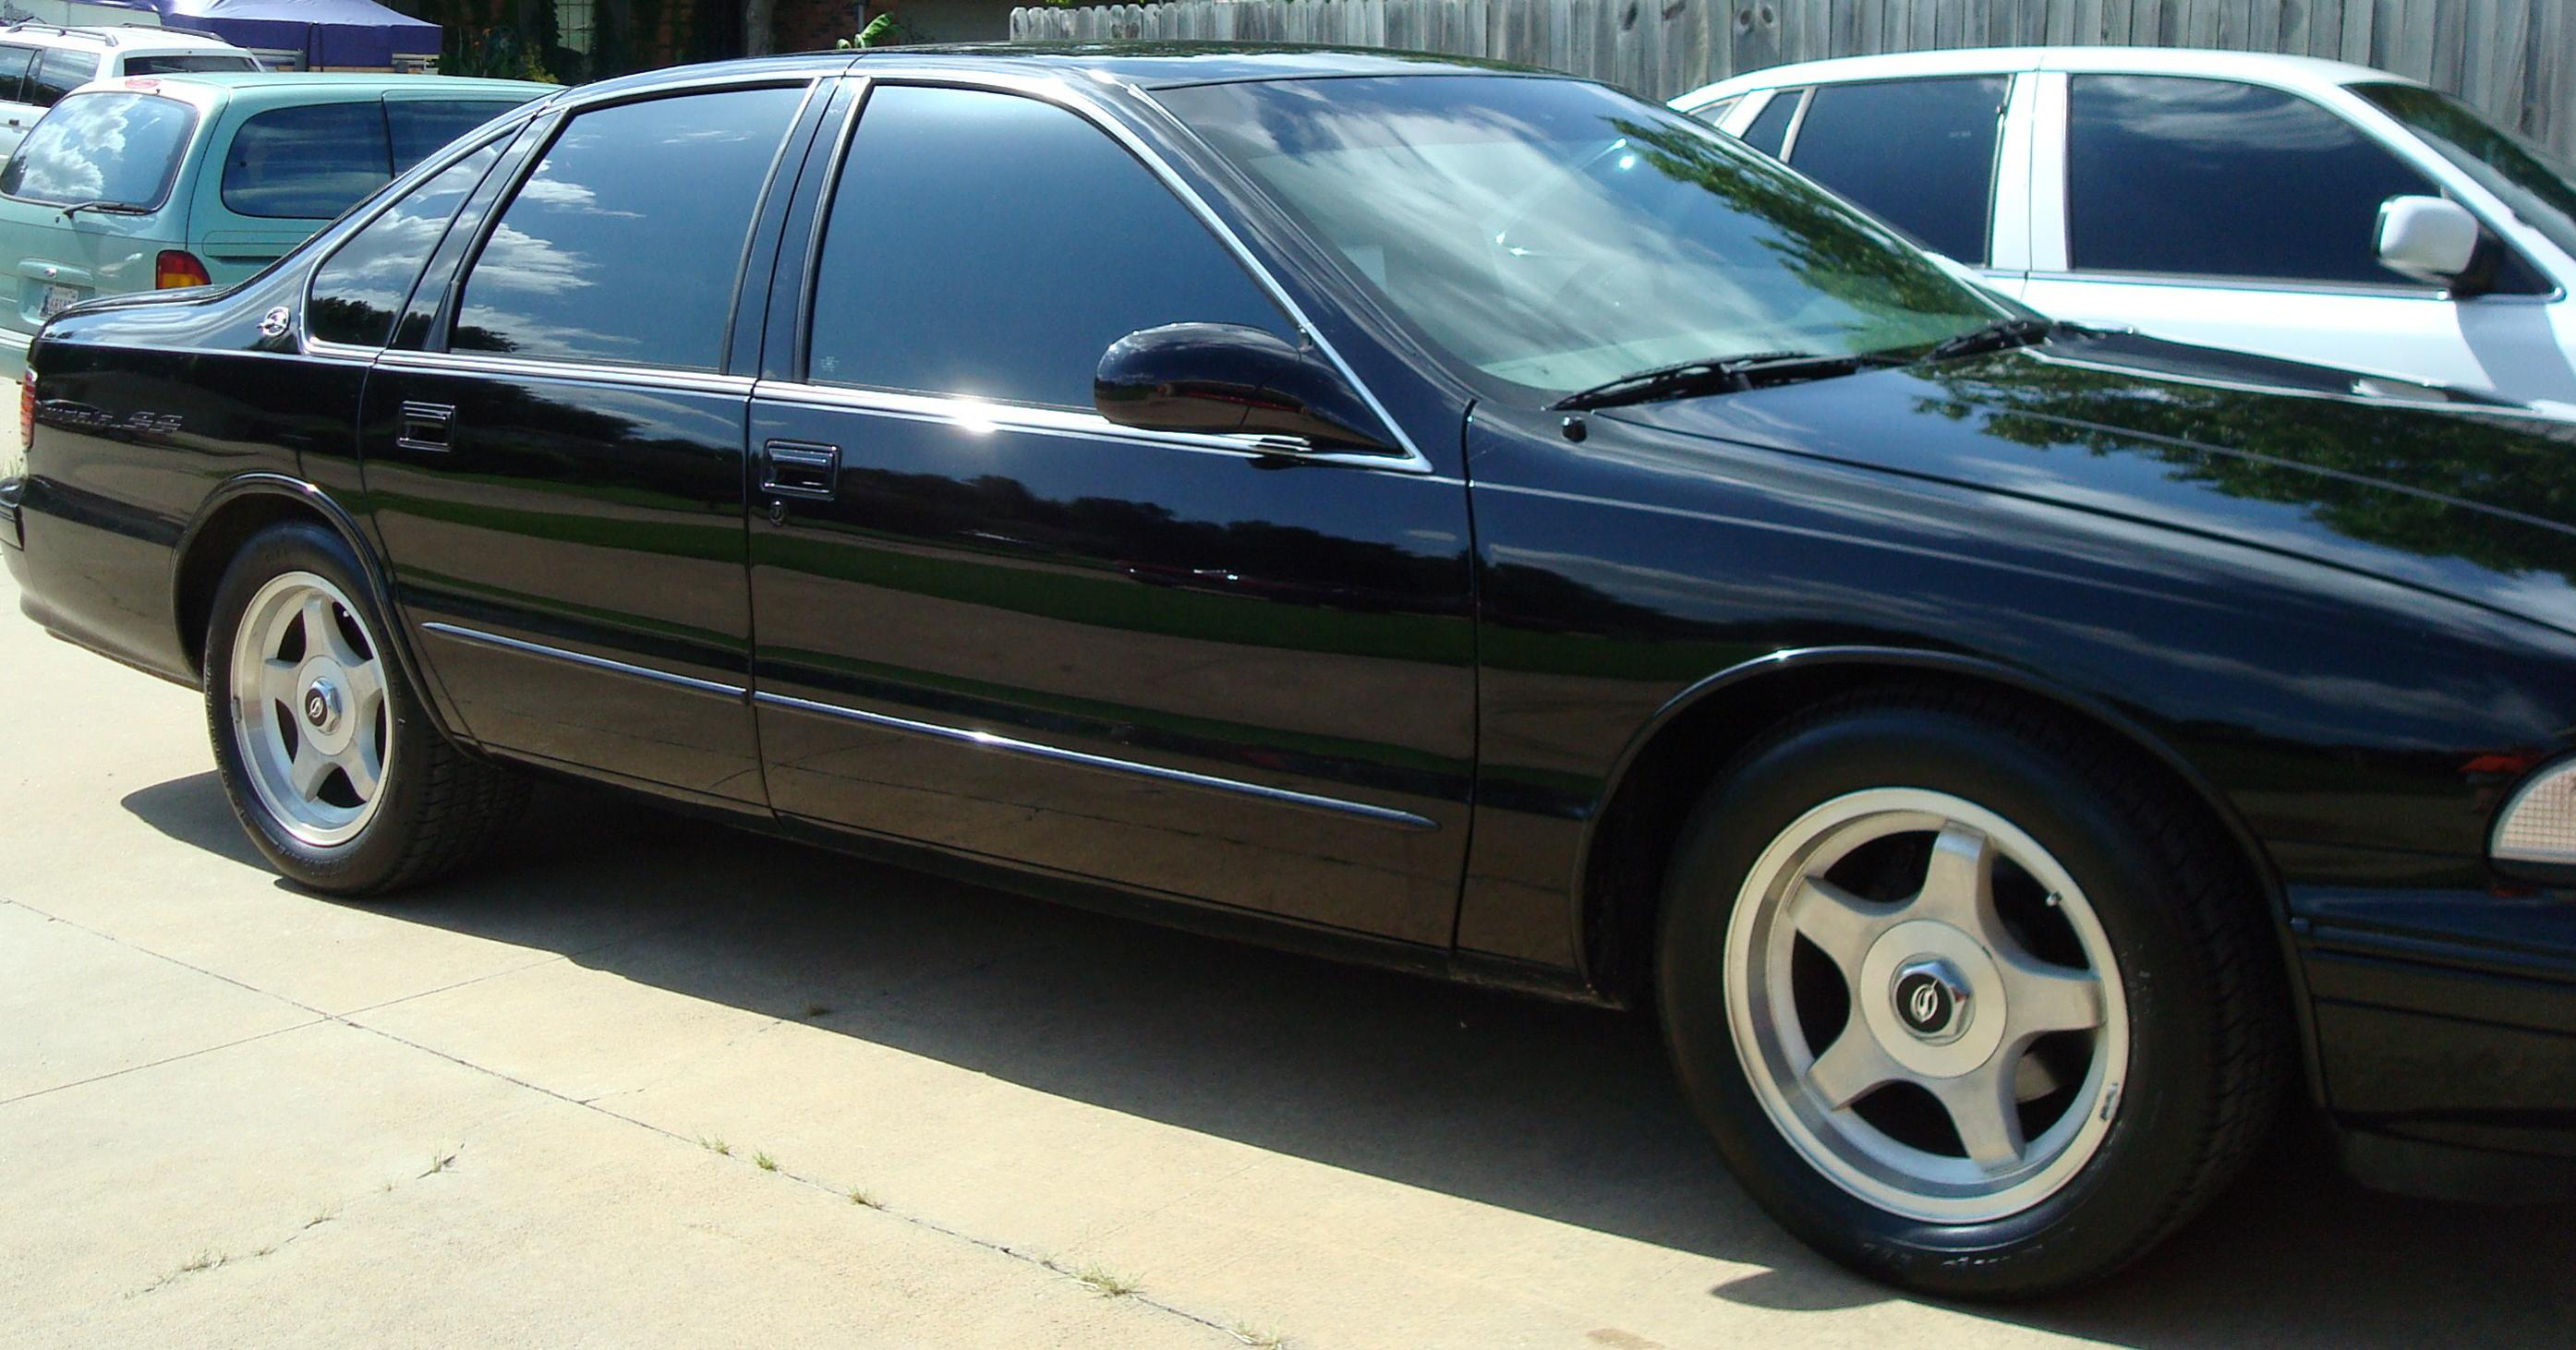 FS:1996 Impala SS-impala-z06-morgan-027.jpg